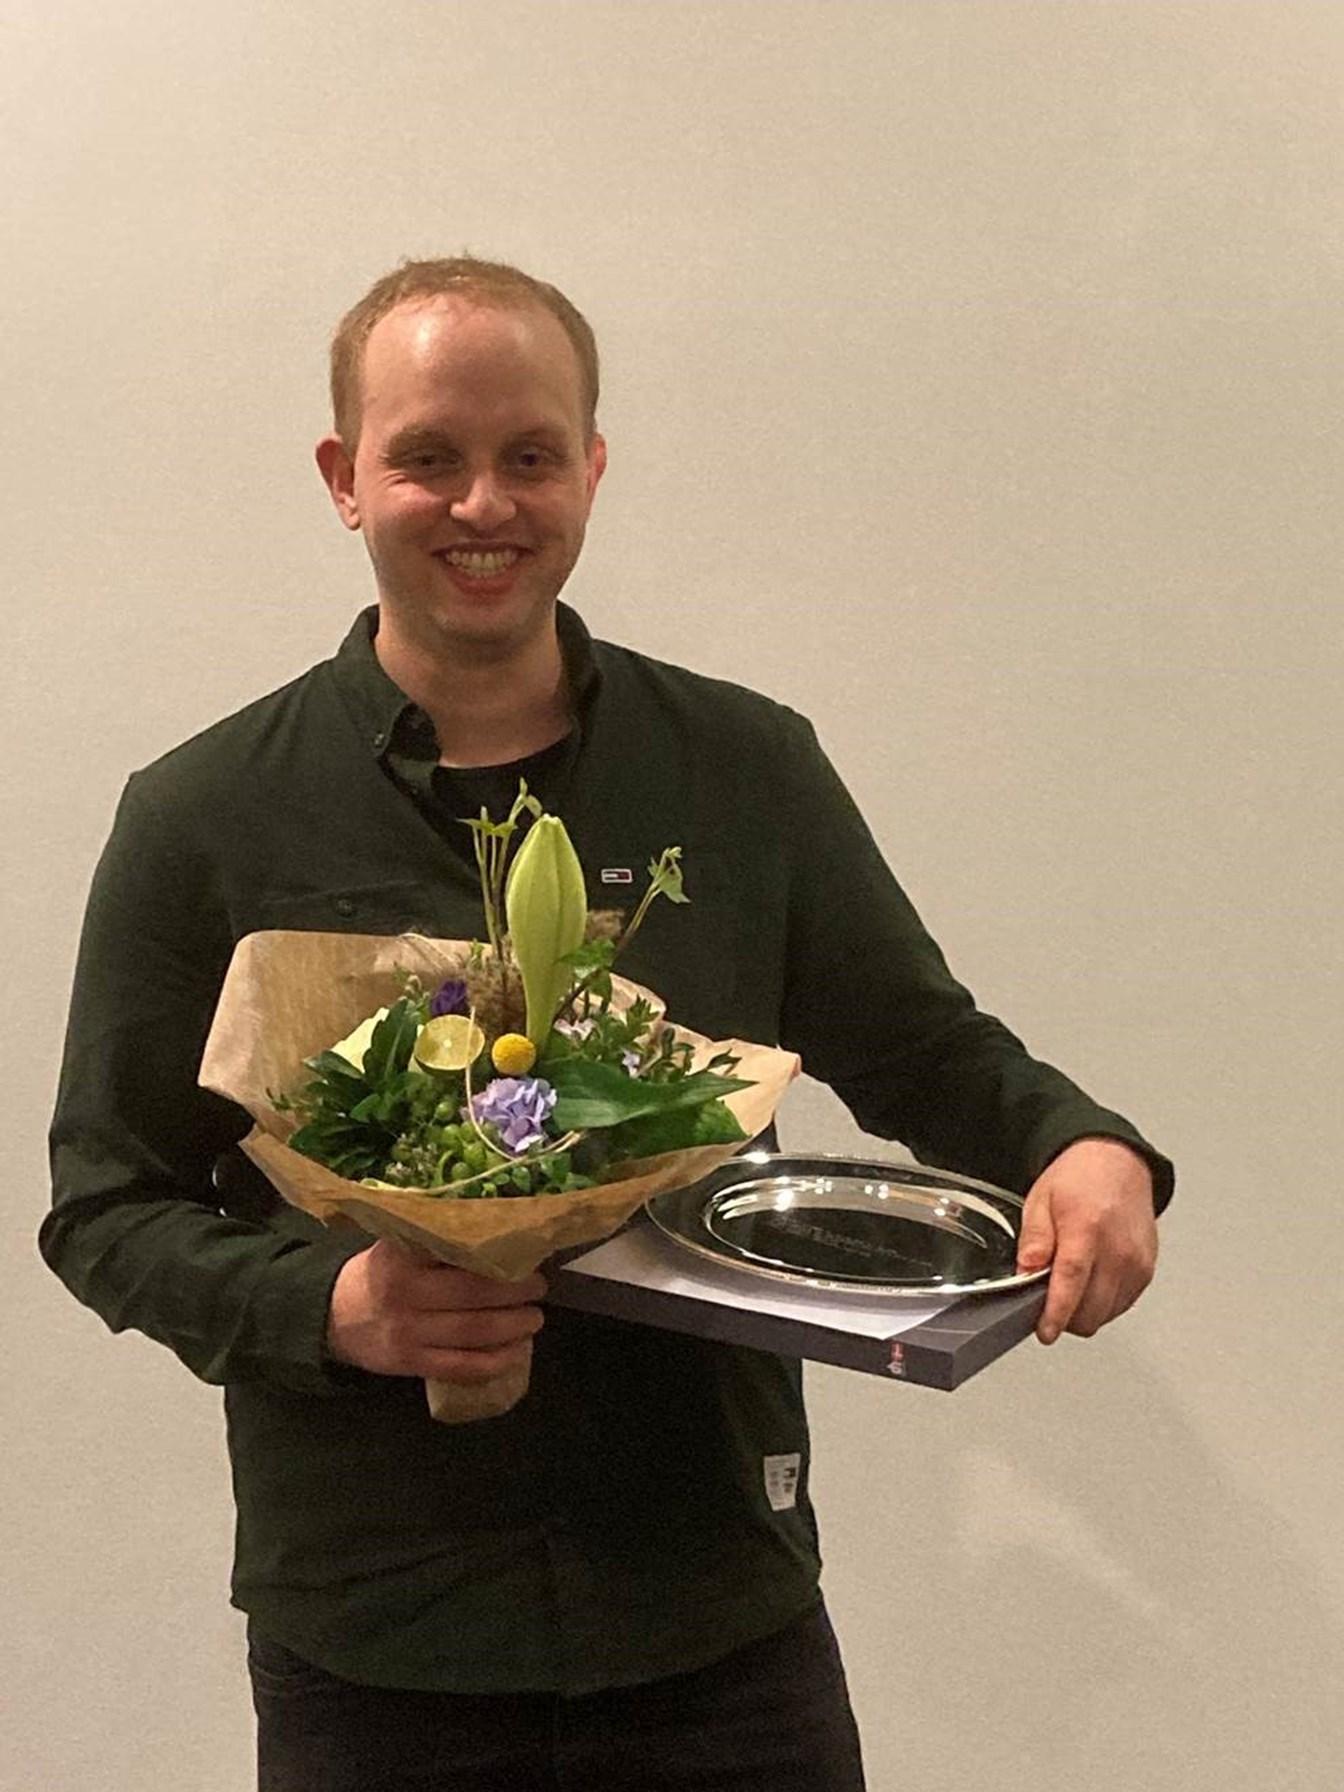 Danny Hjortbøl